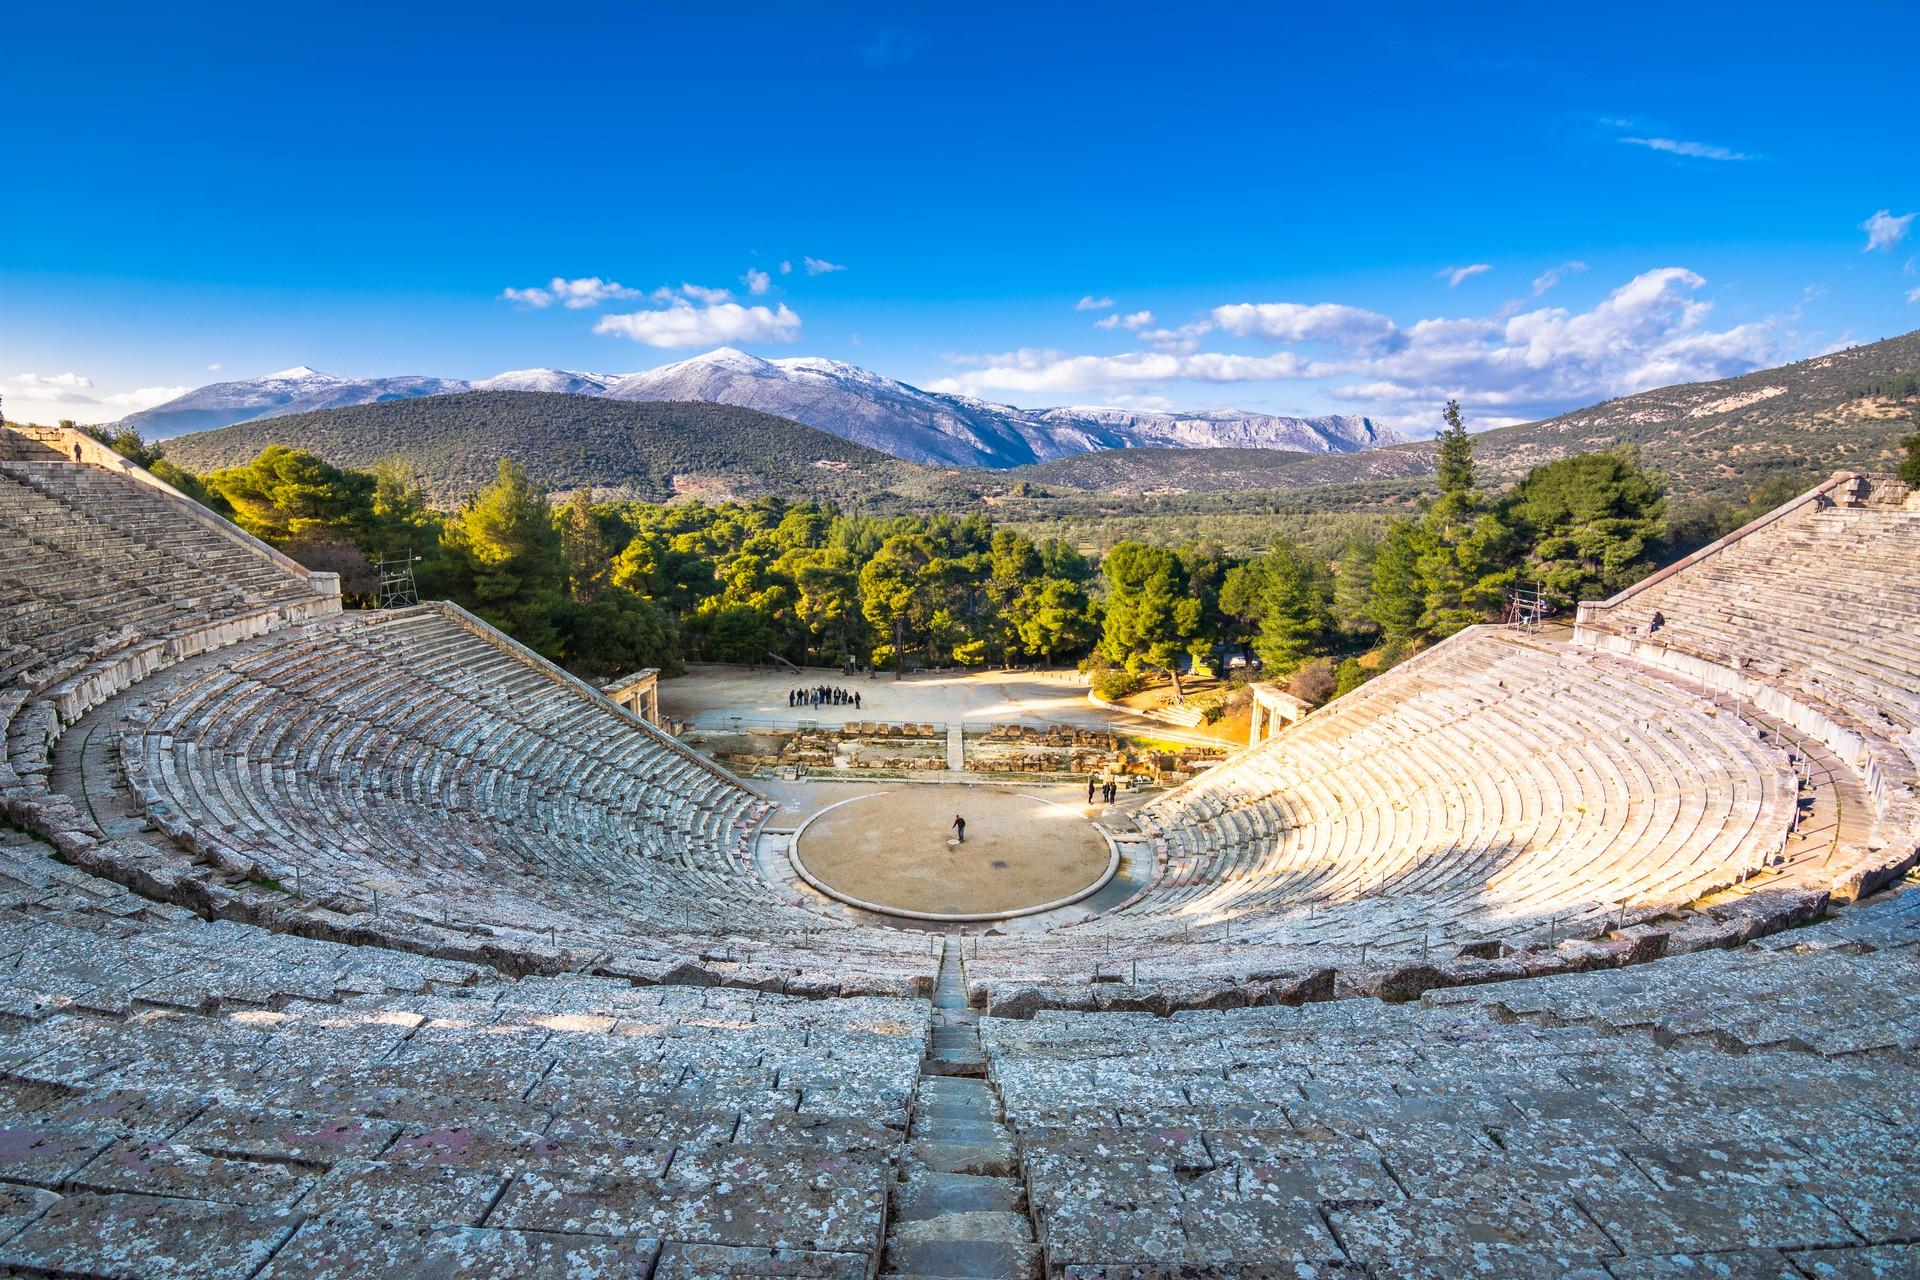 Epidaurus in Greece